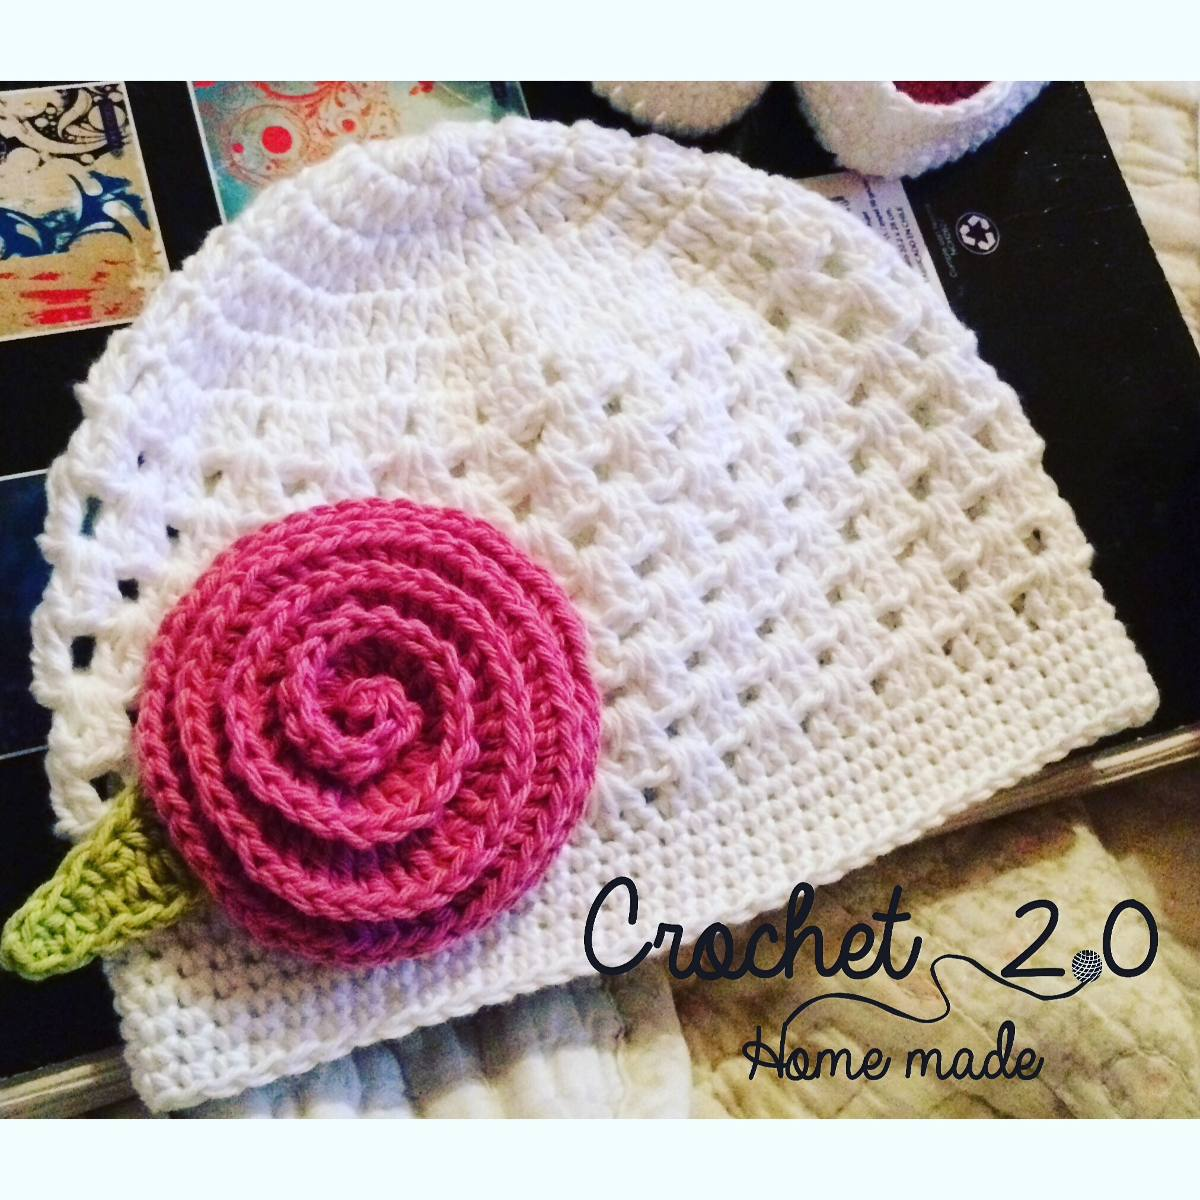 gorros a crochet para bebe hechos a mano en mercado libre. Black Bedroom Furniture Sets. Home Design Ideas